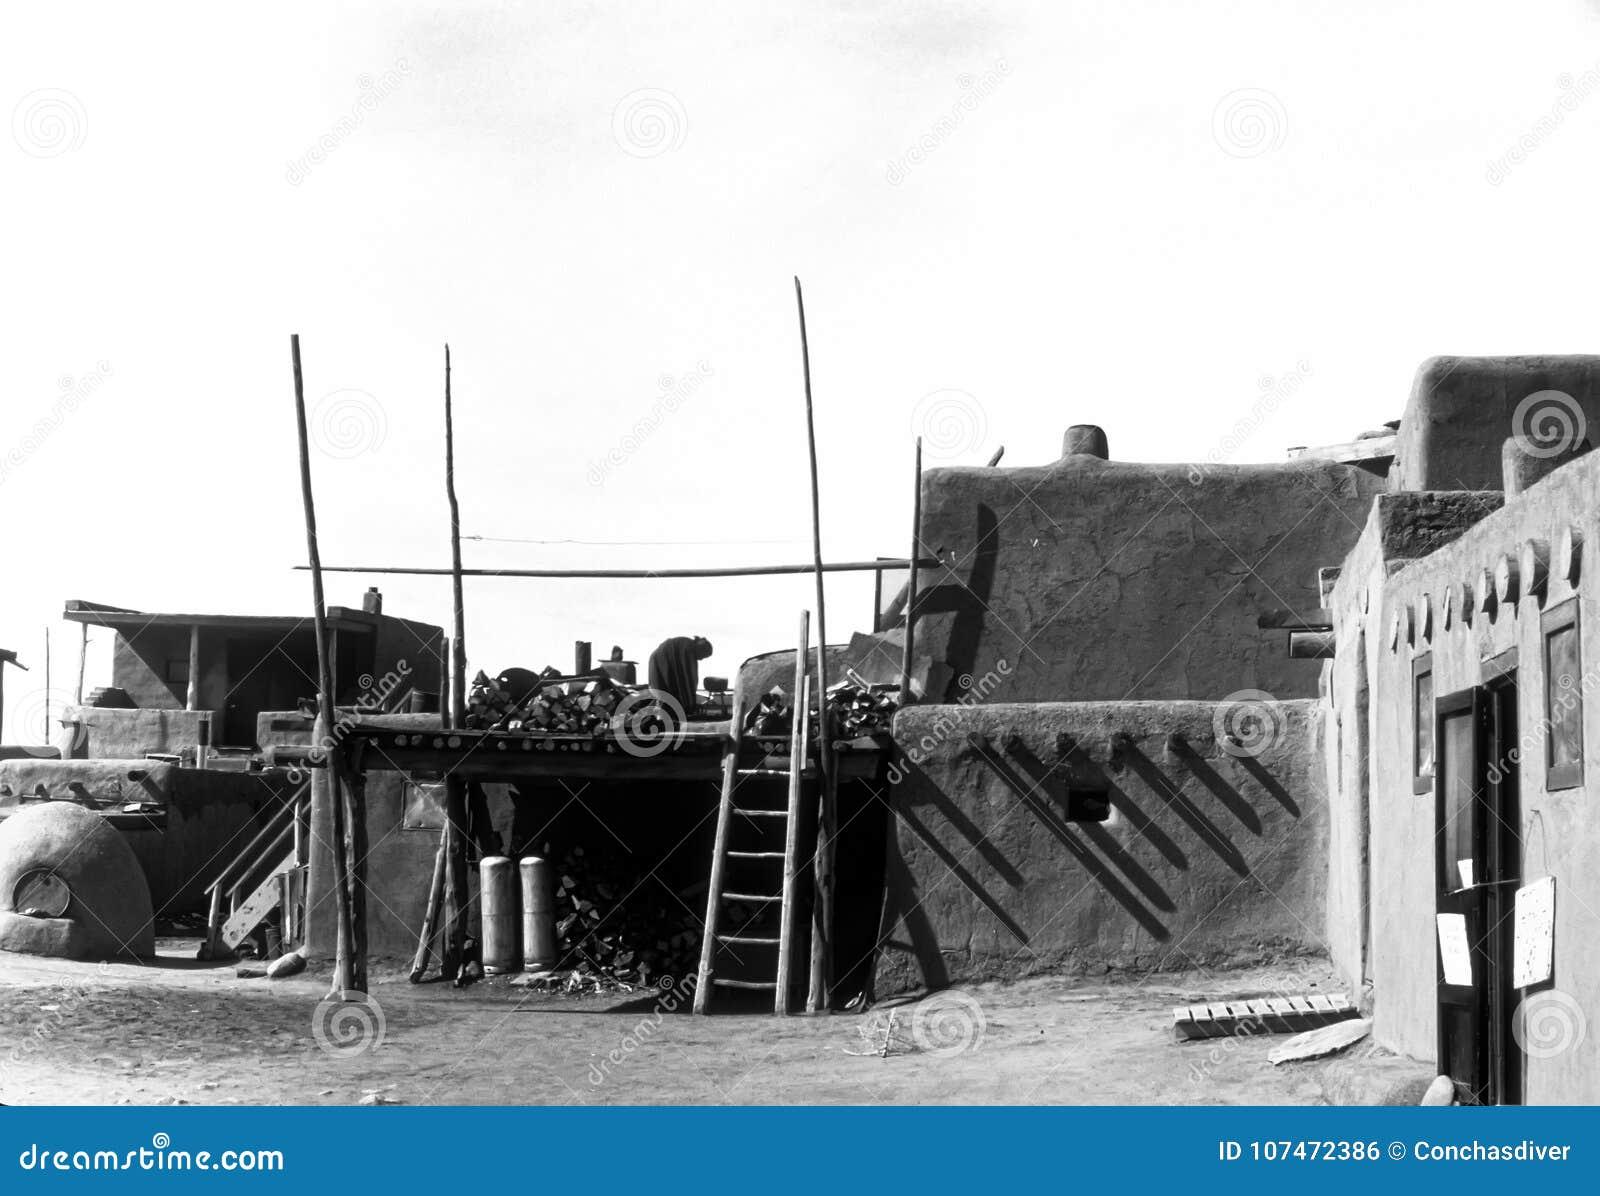 Taos Pueblo, New Mexico | New mexico homes, Taos new ...  |Taos Pueblo New Mexico Usa